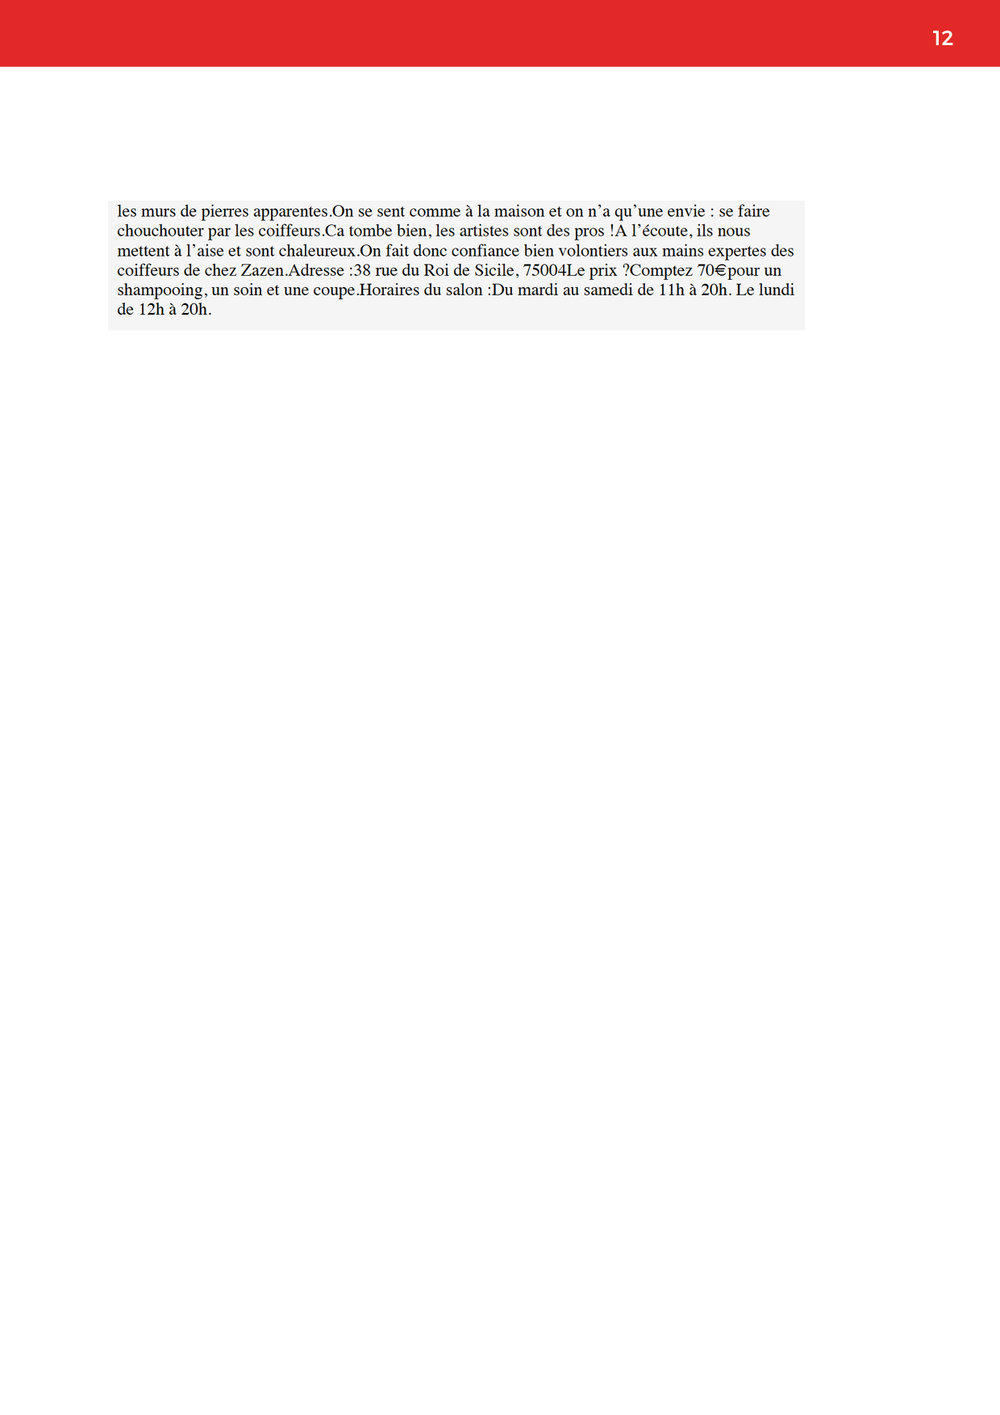 BOOKMEDIA_OCT_012.jpg